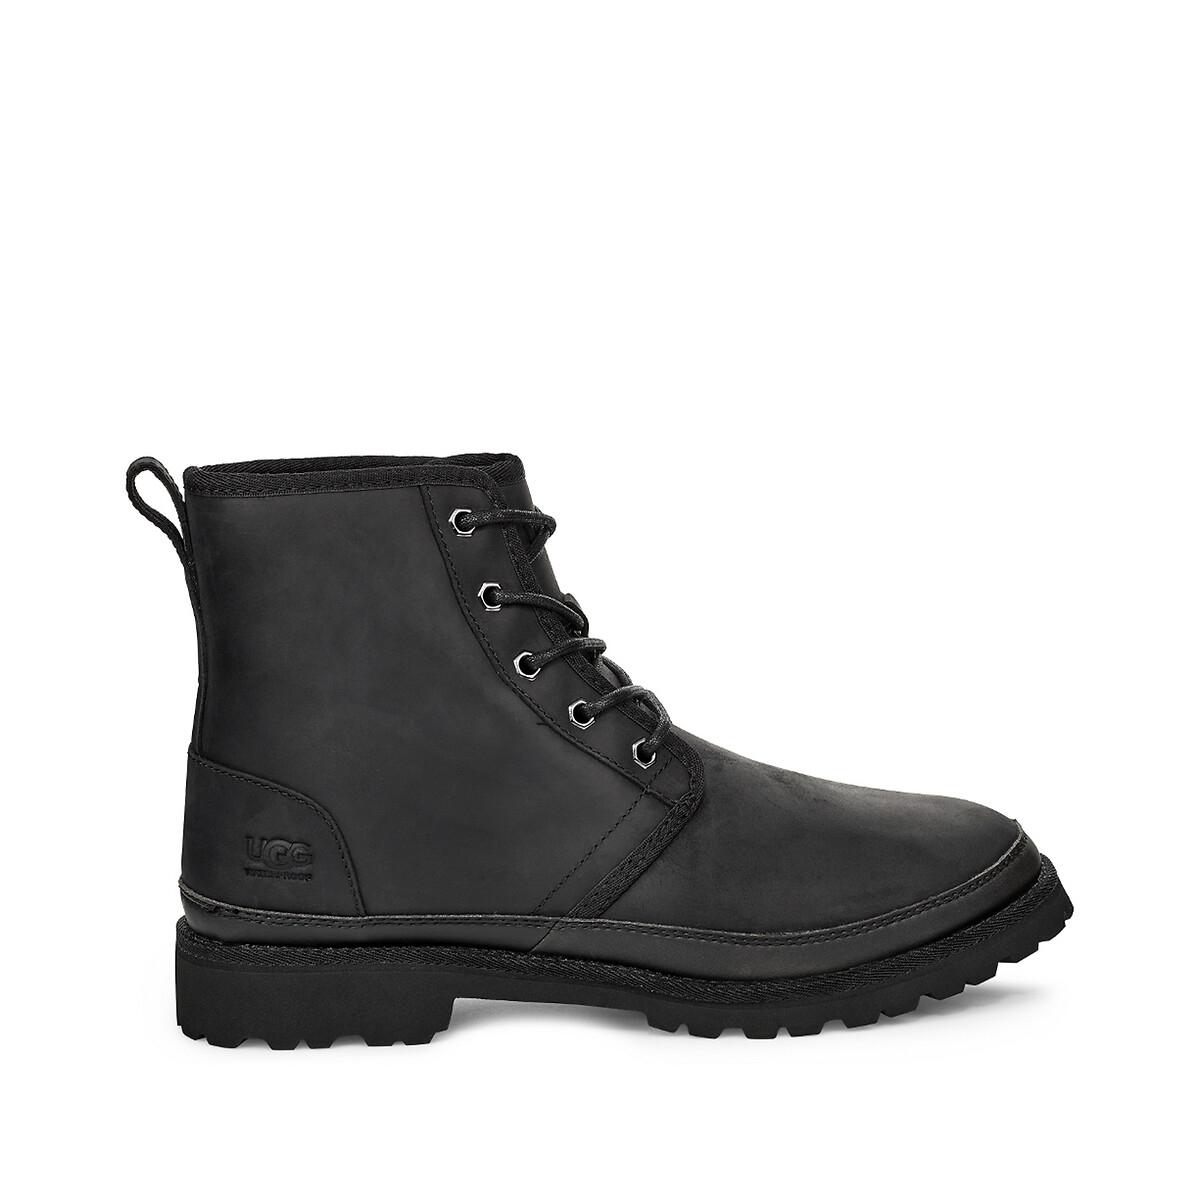 Boots Harkland WP